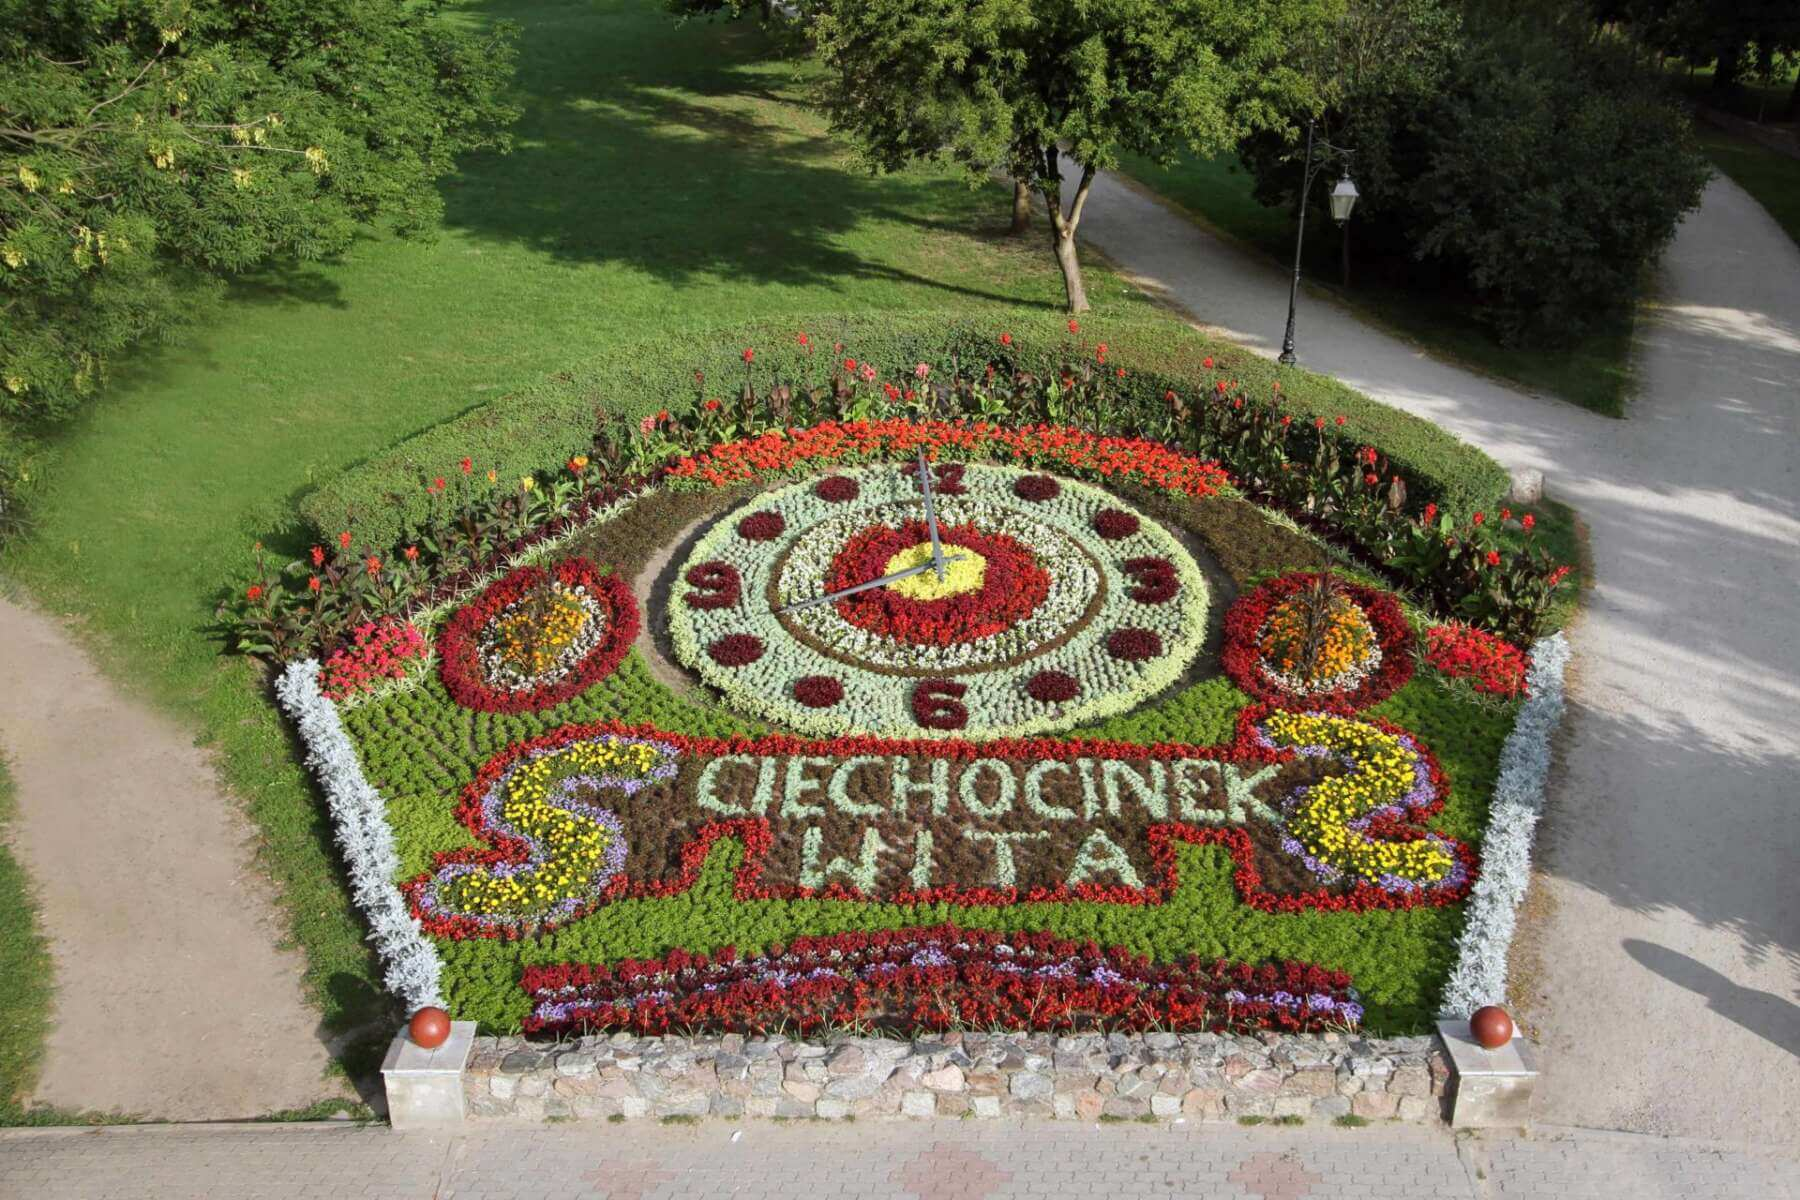 ciechocinek - Zegar kwiatowy